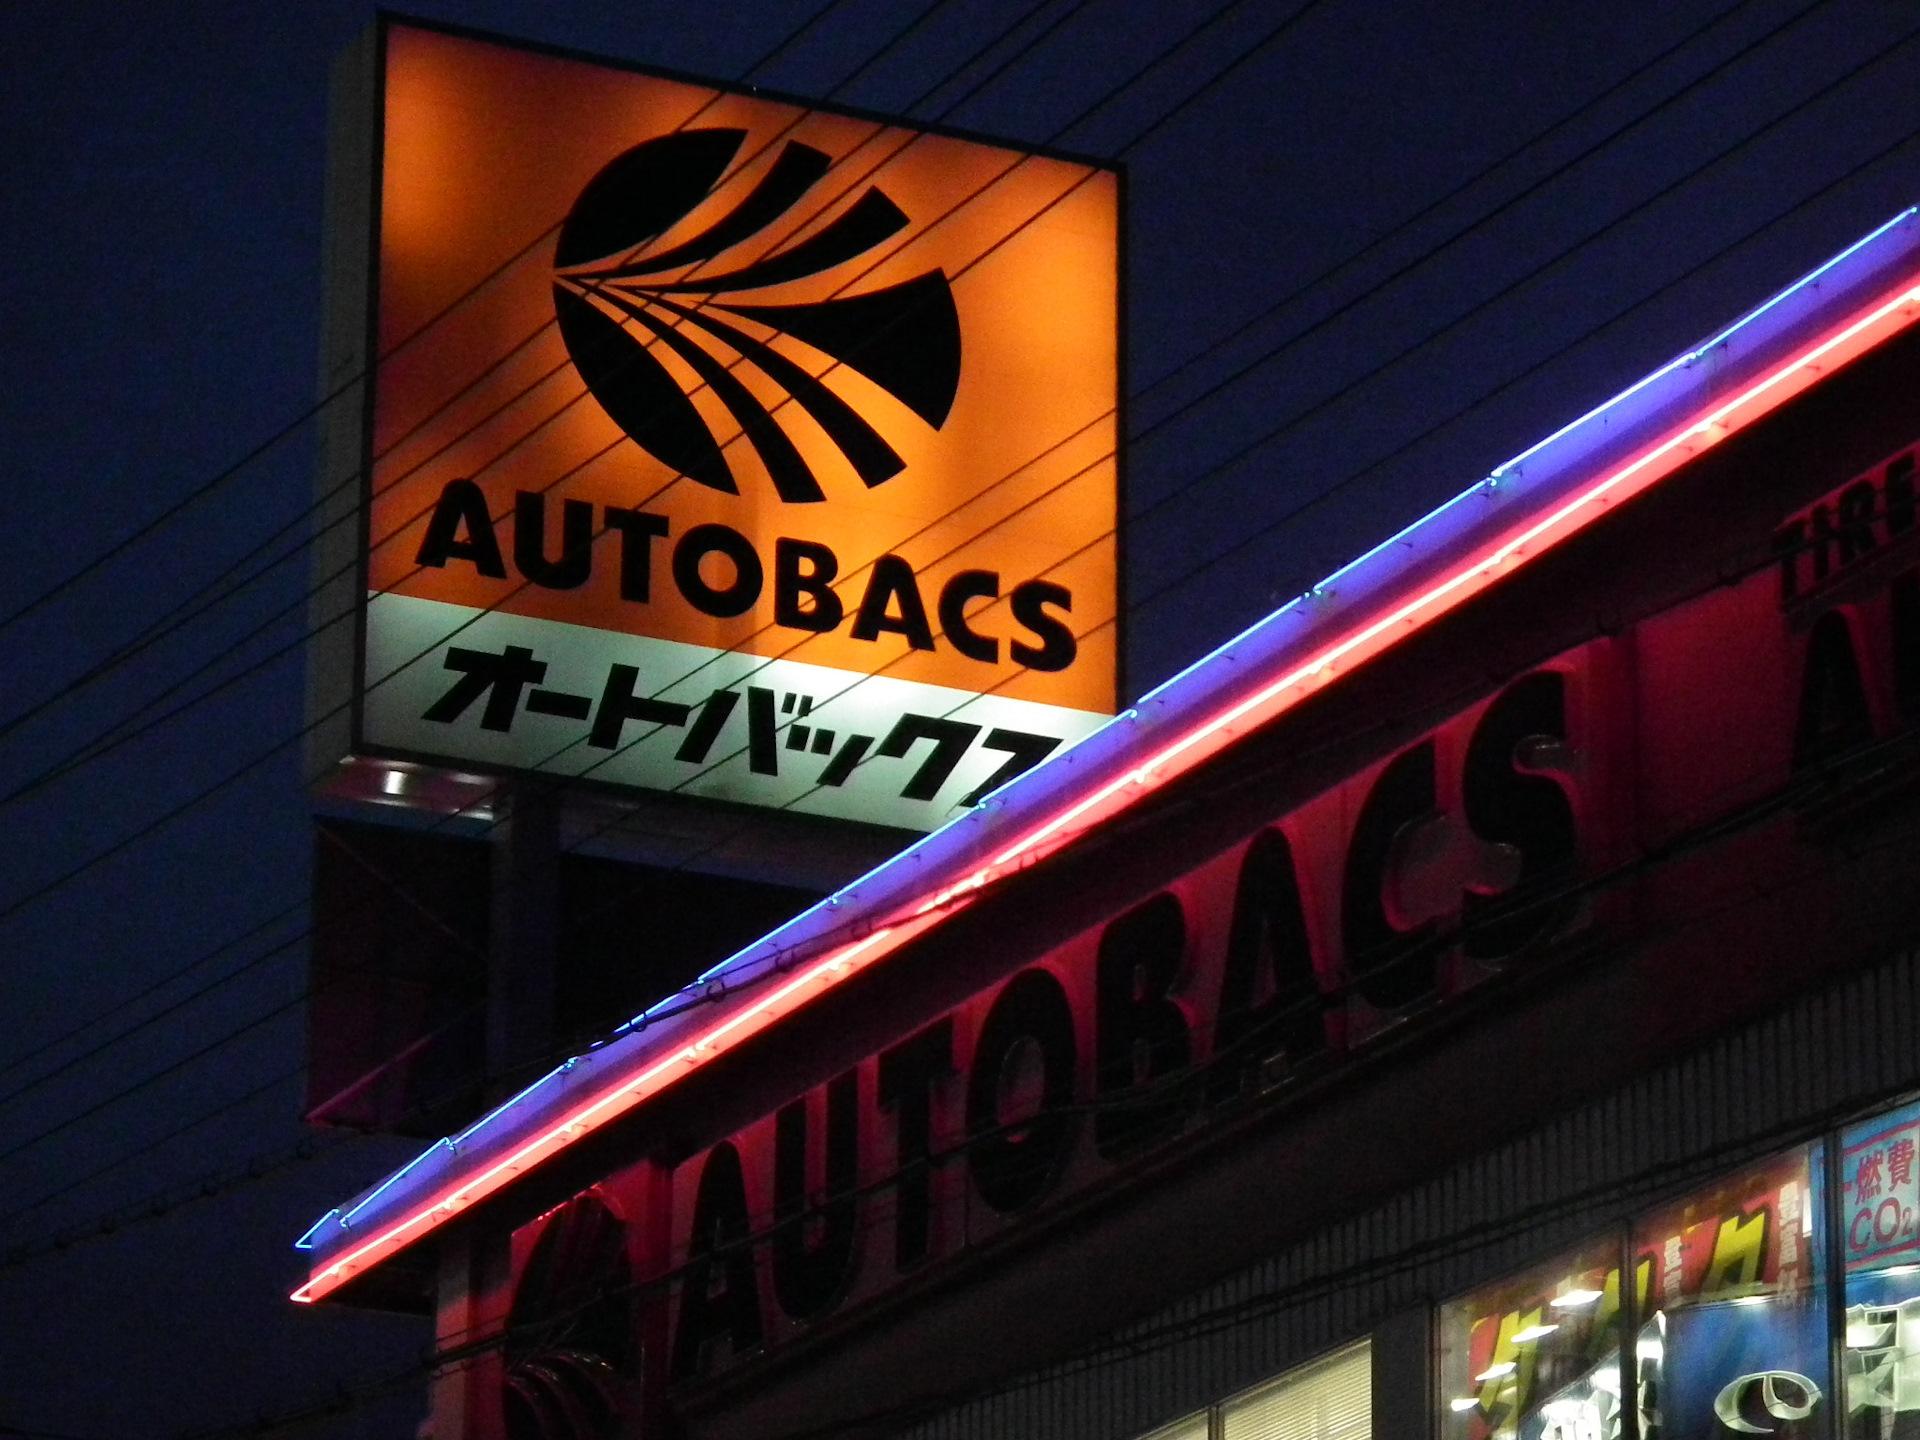 Autobacs Seven Company, Limited